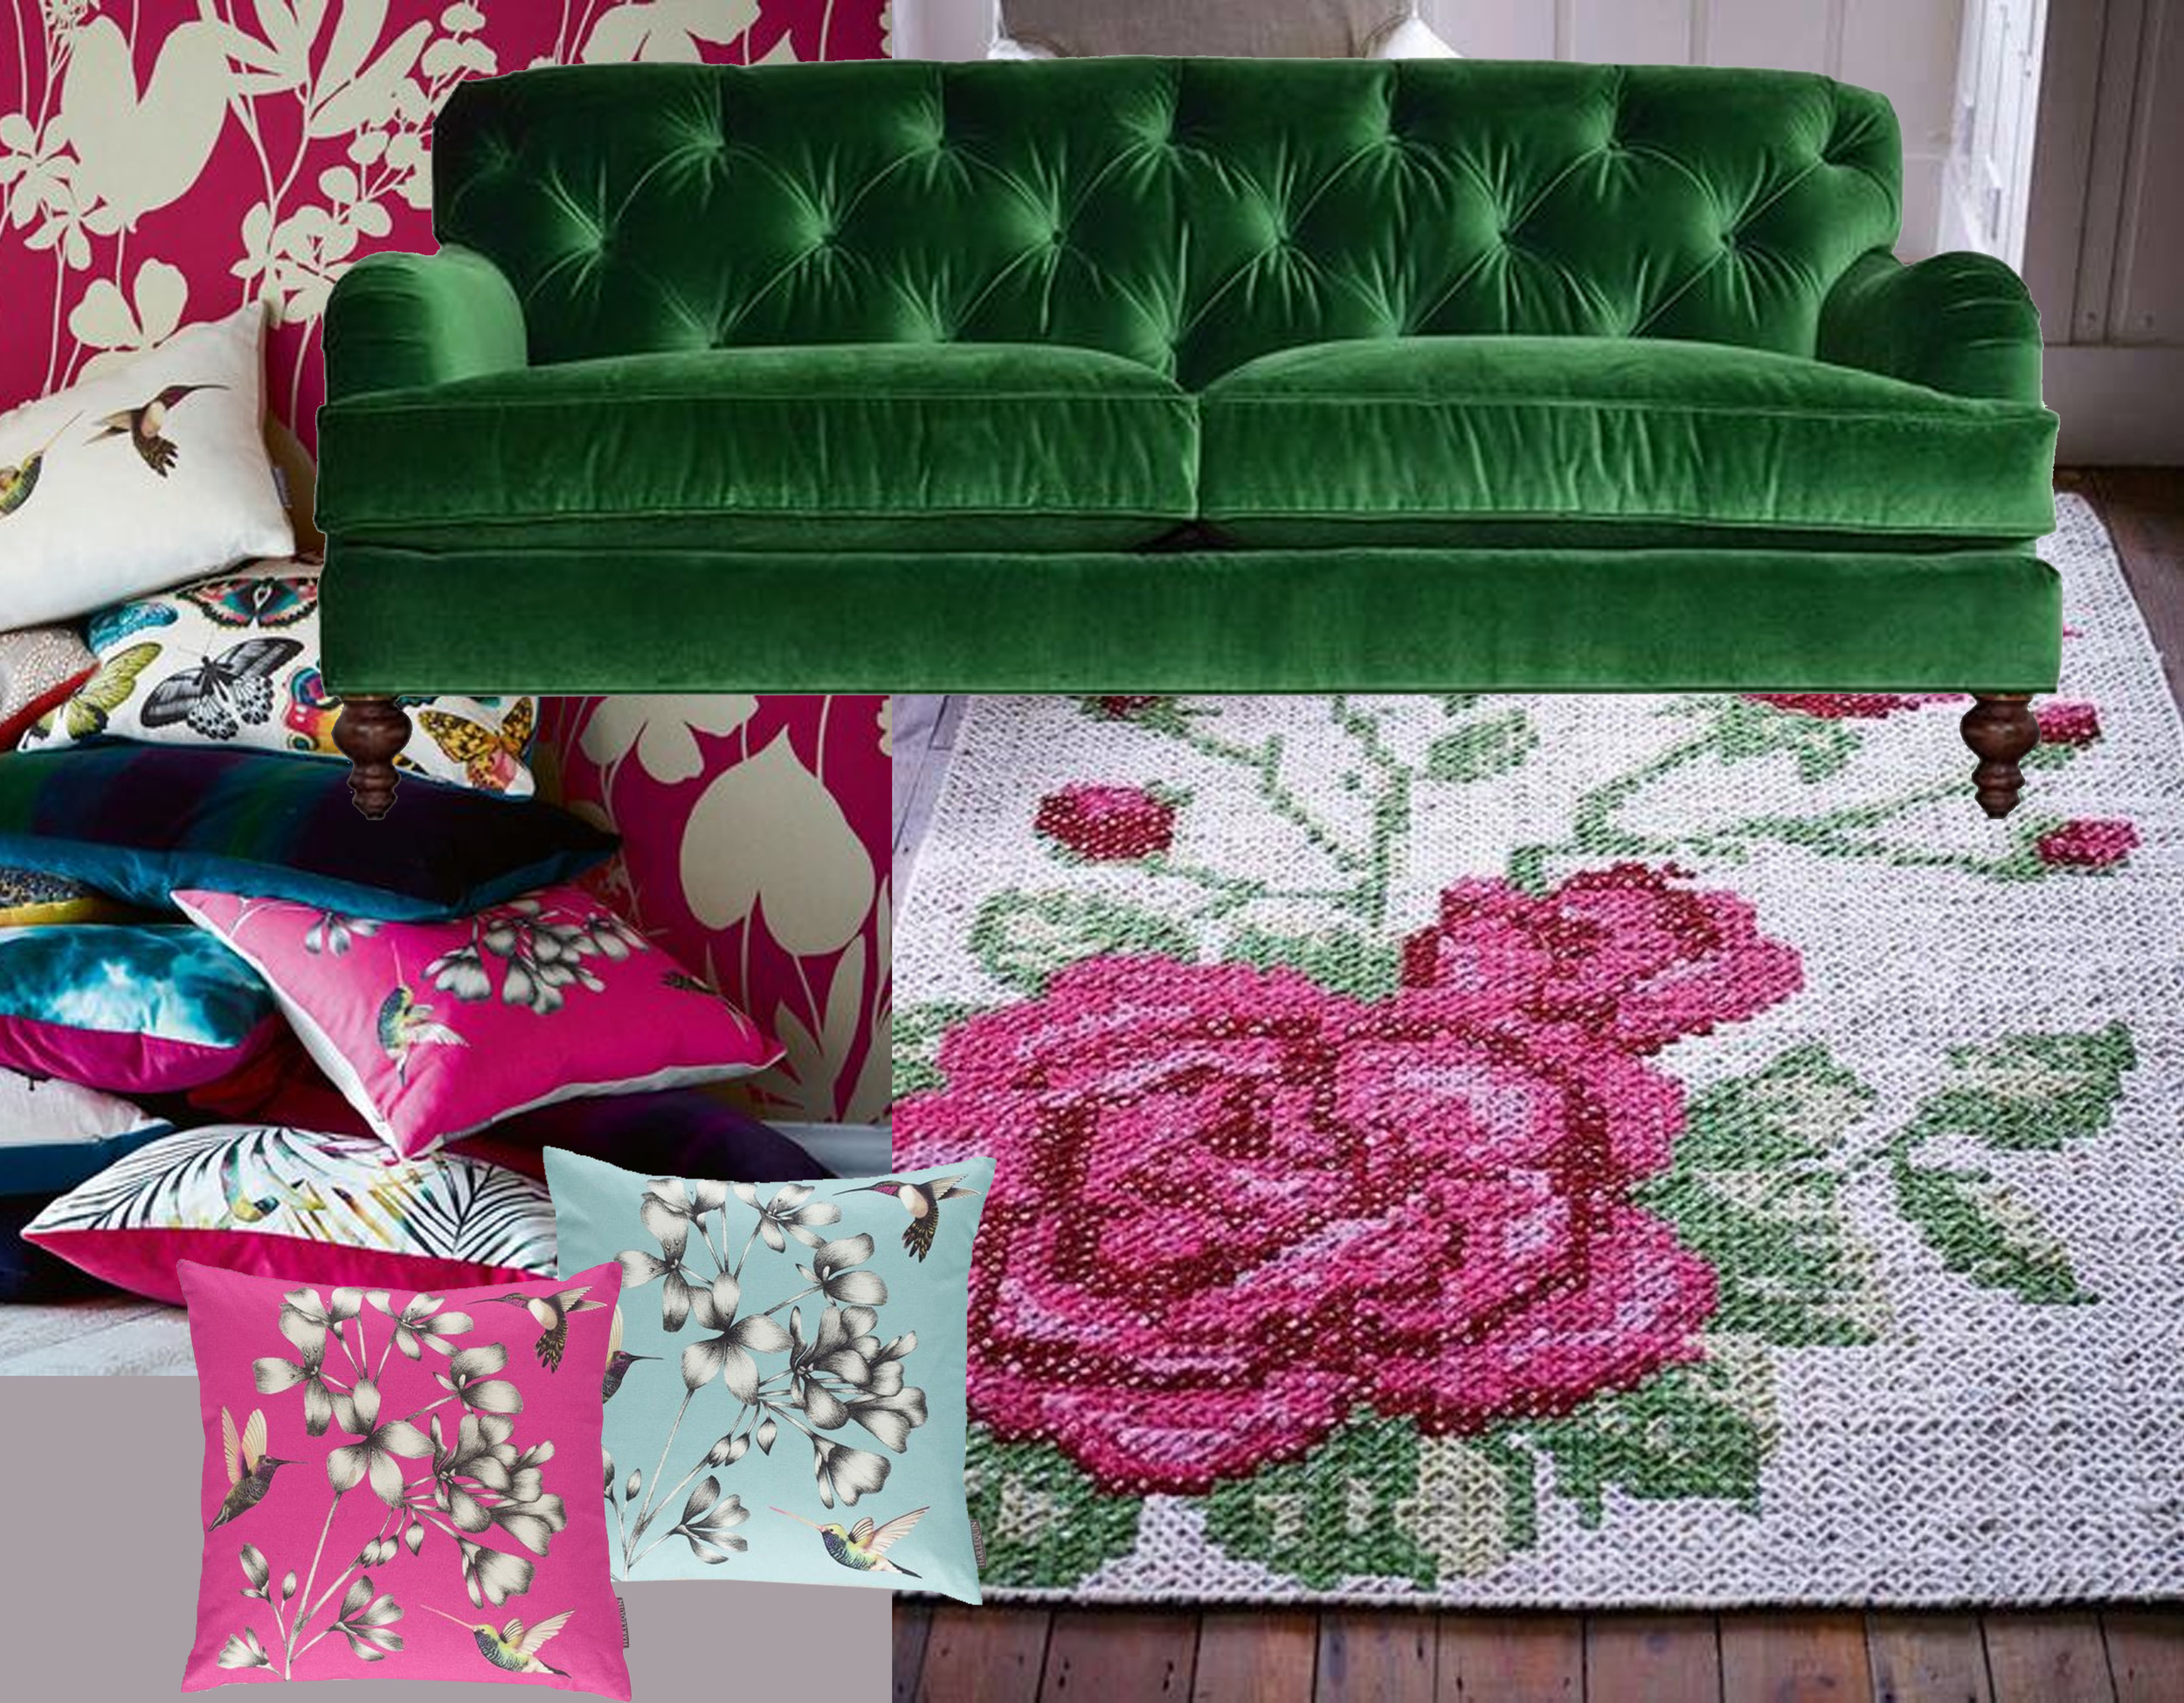 cushions  Harlequin  - Alfie tufted sofa  Roger+Chris  - cross-stitch rug on  Pinterest